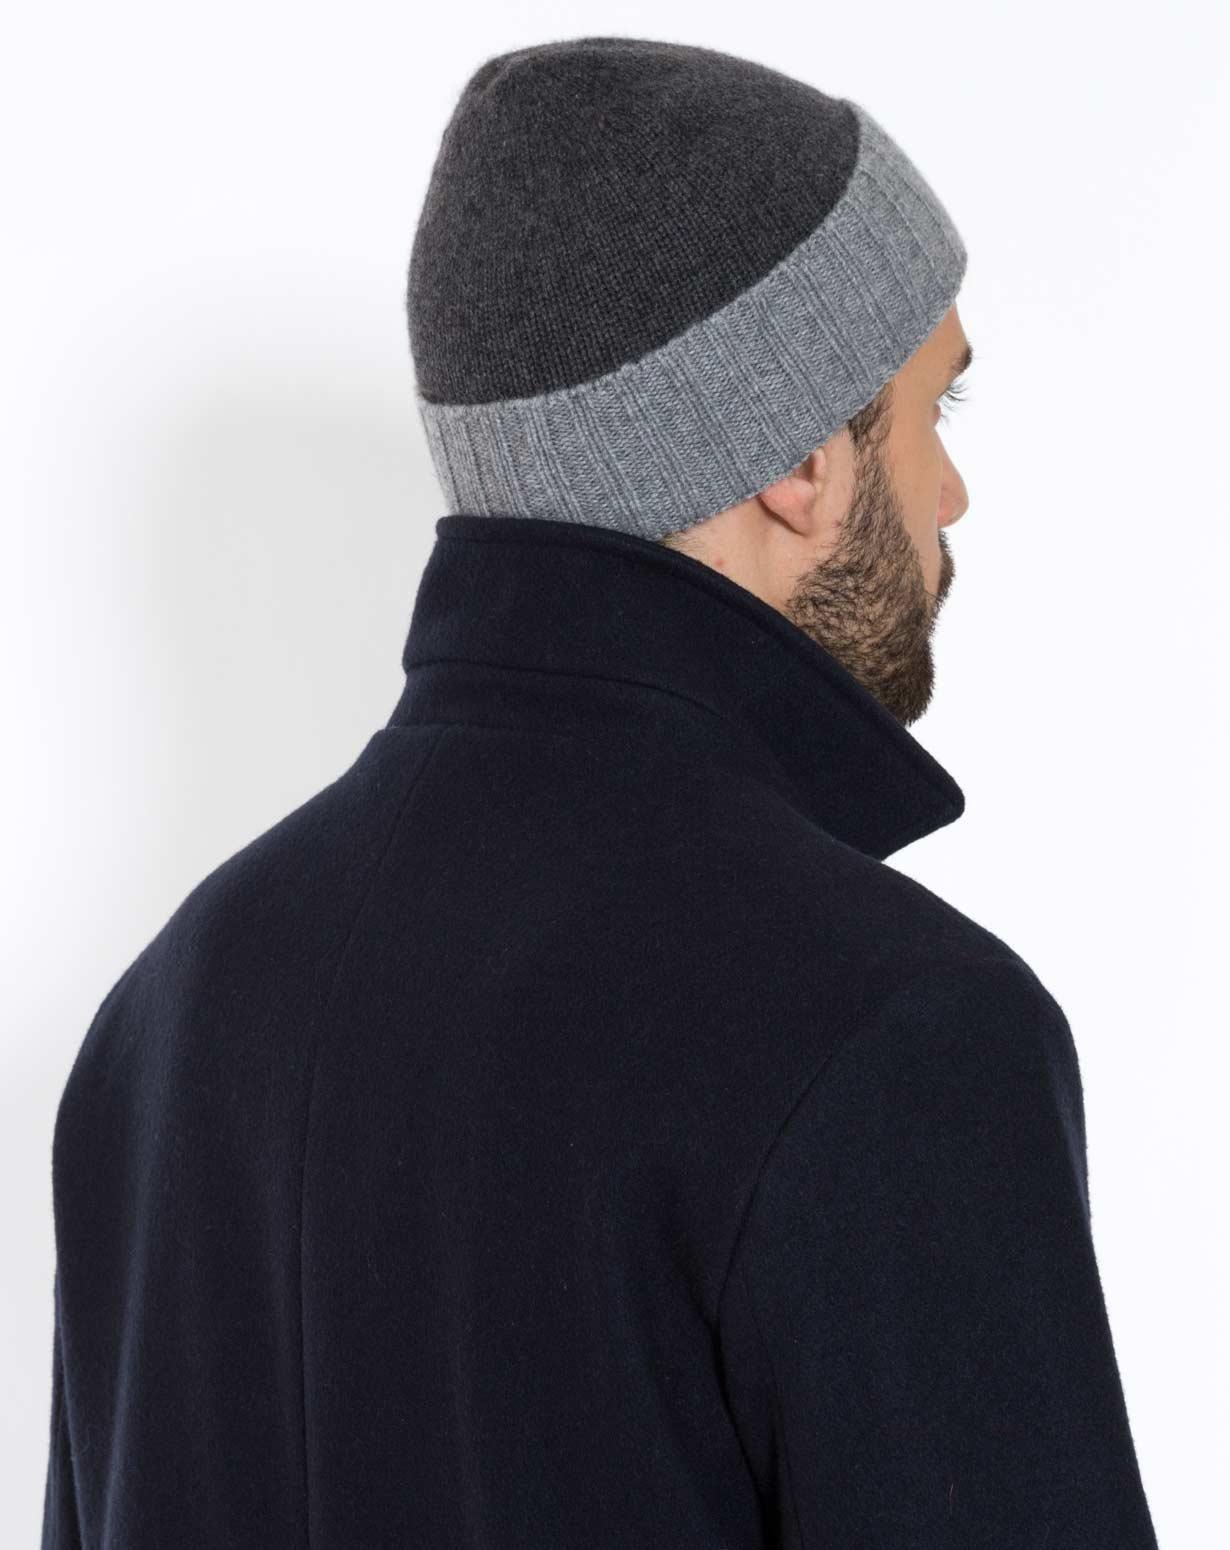 Men's Pure Cashmere Bicolor Cap